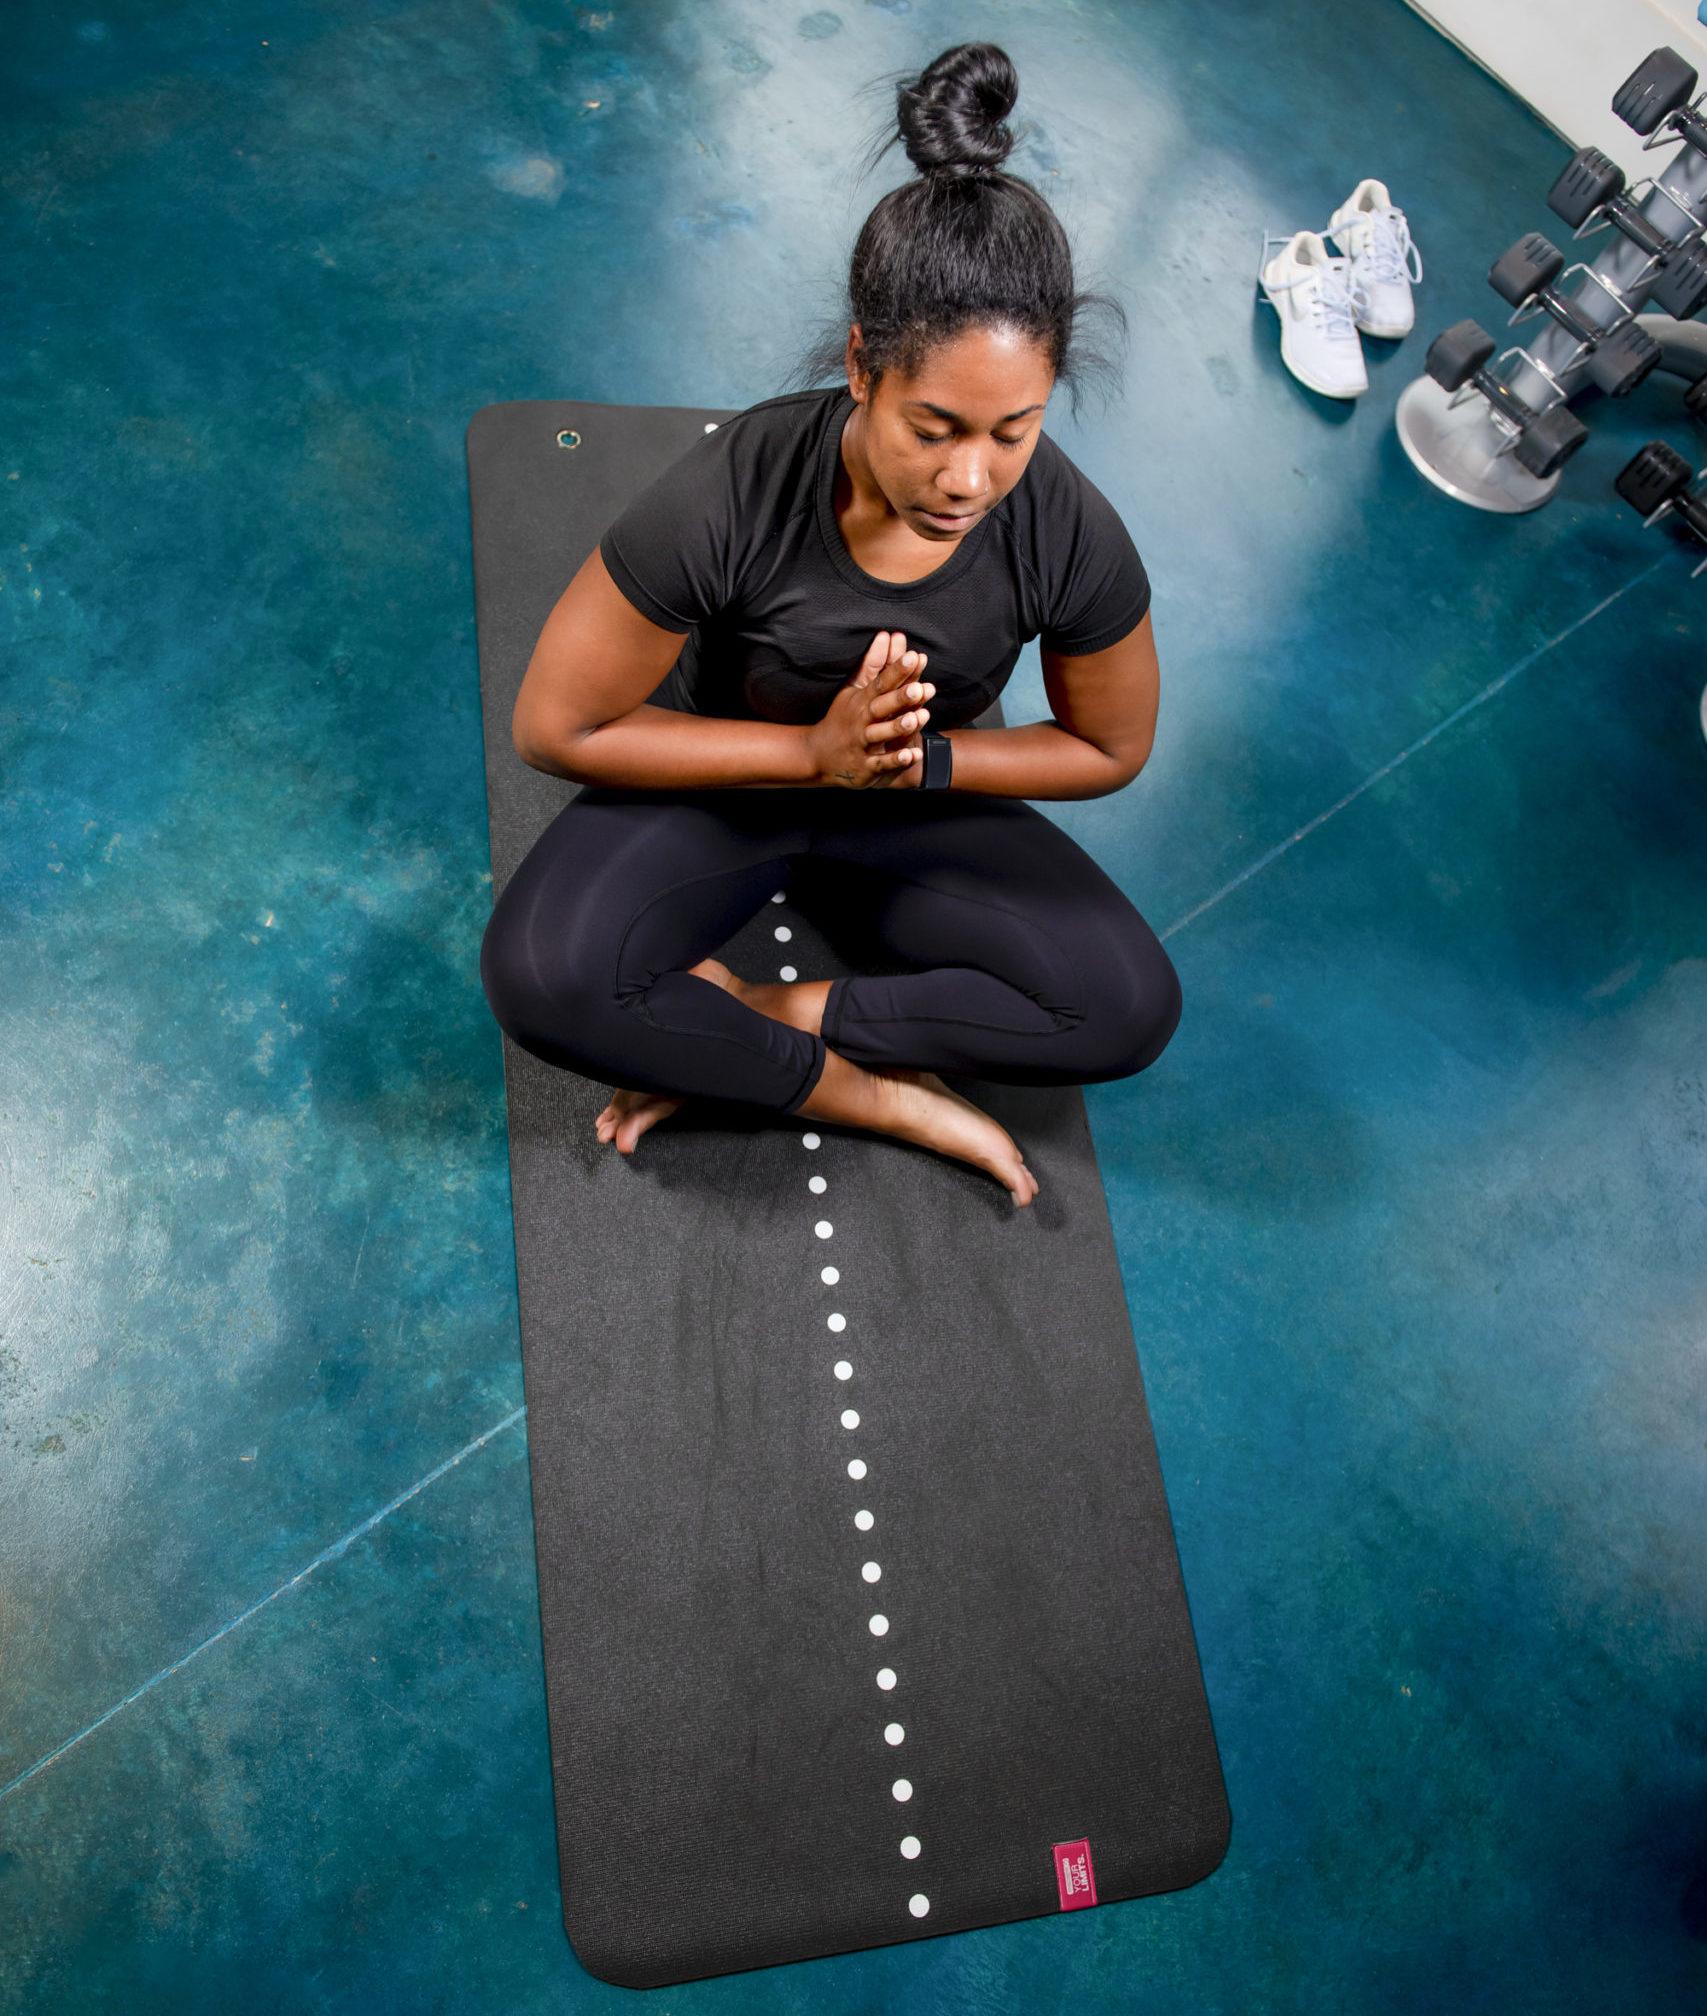 girl meditating at evolve community new workout